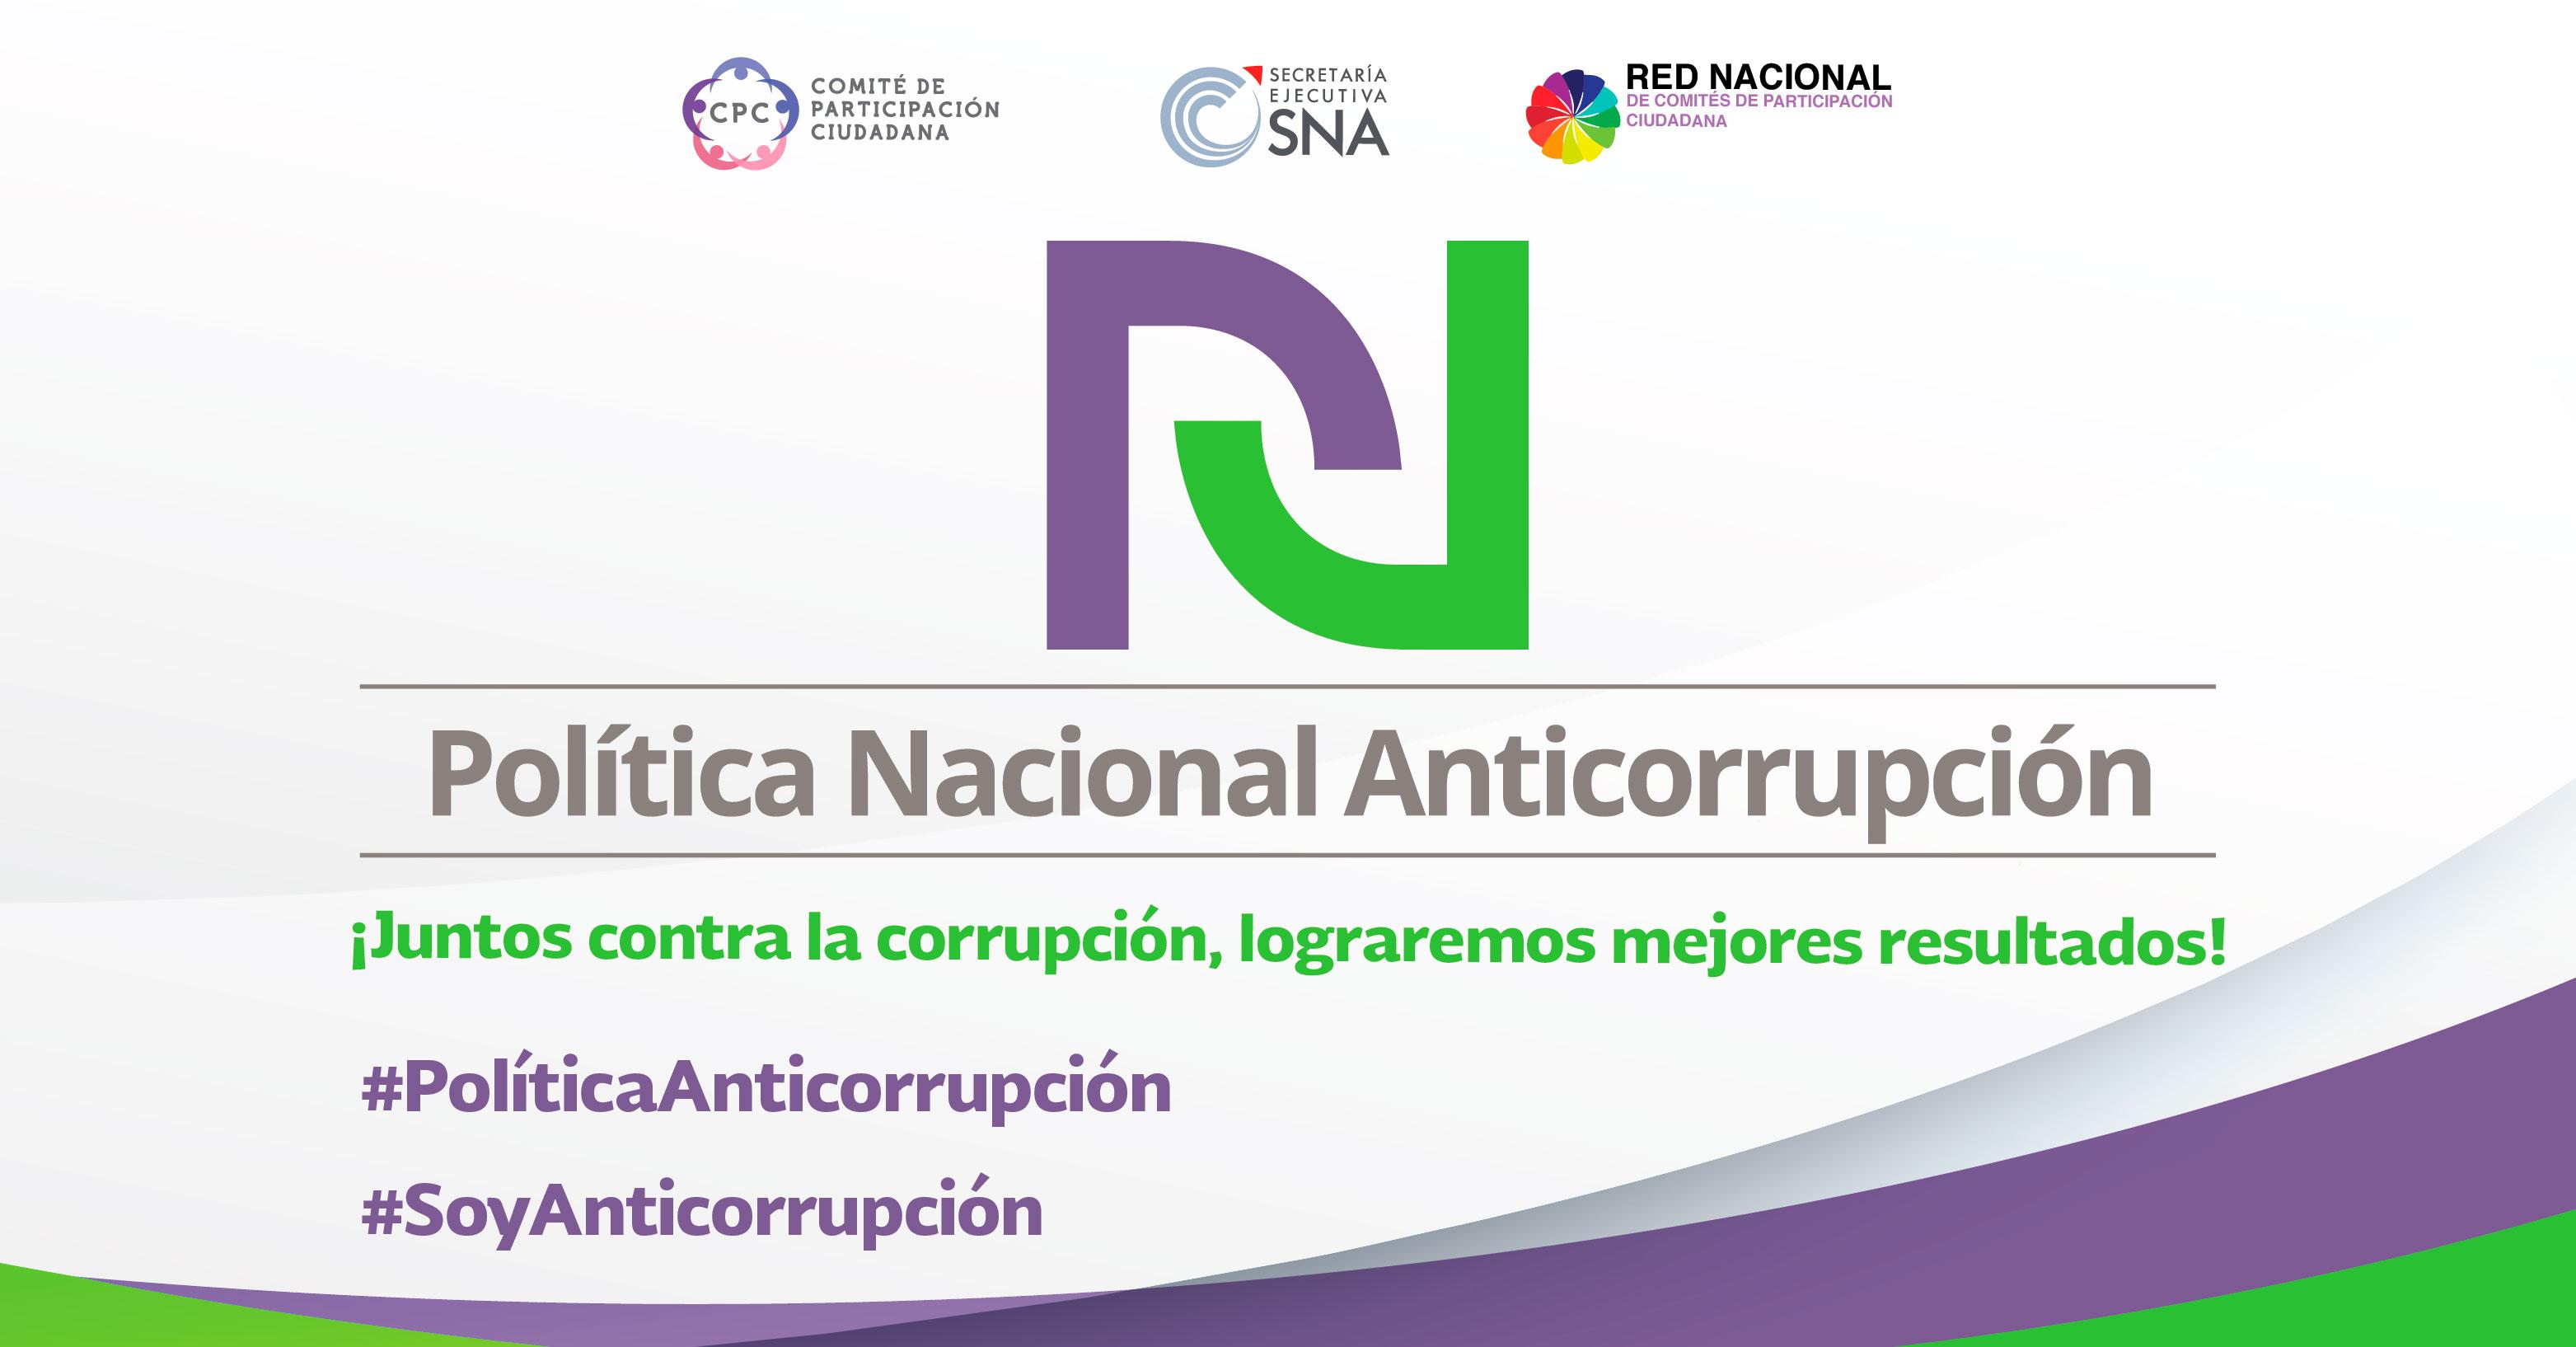 Política Nacional Anticorrupción